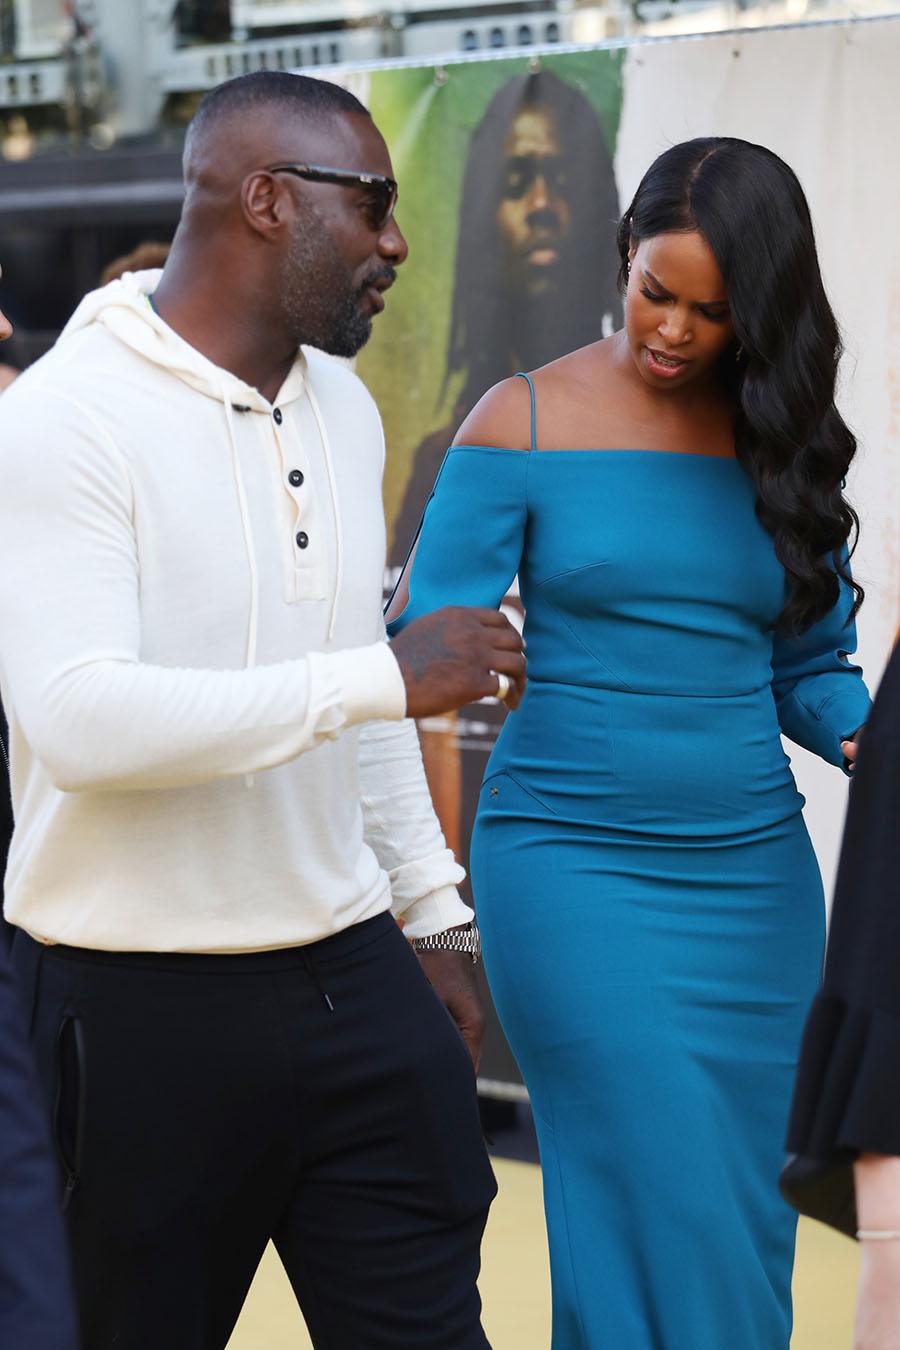 British Power Couple Idris Elba And Sabrina Dhowre